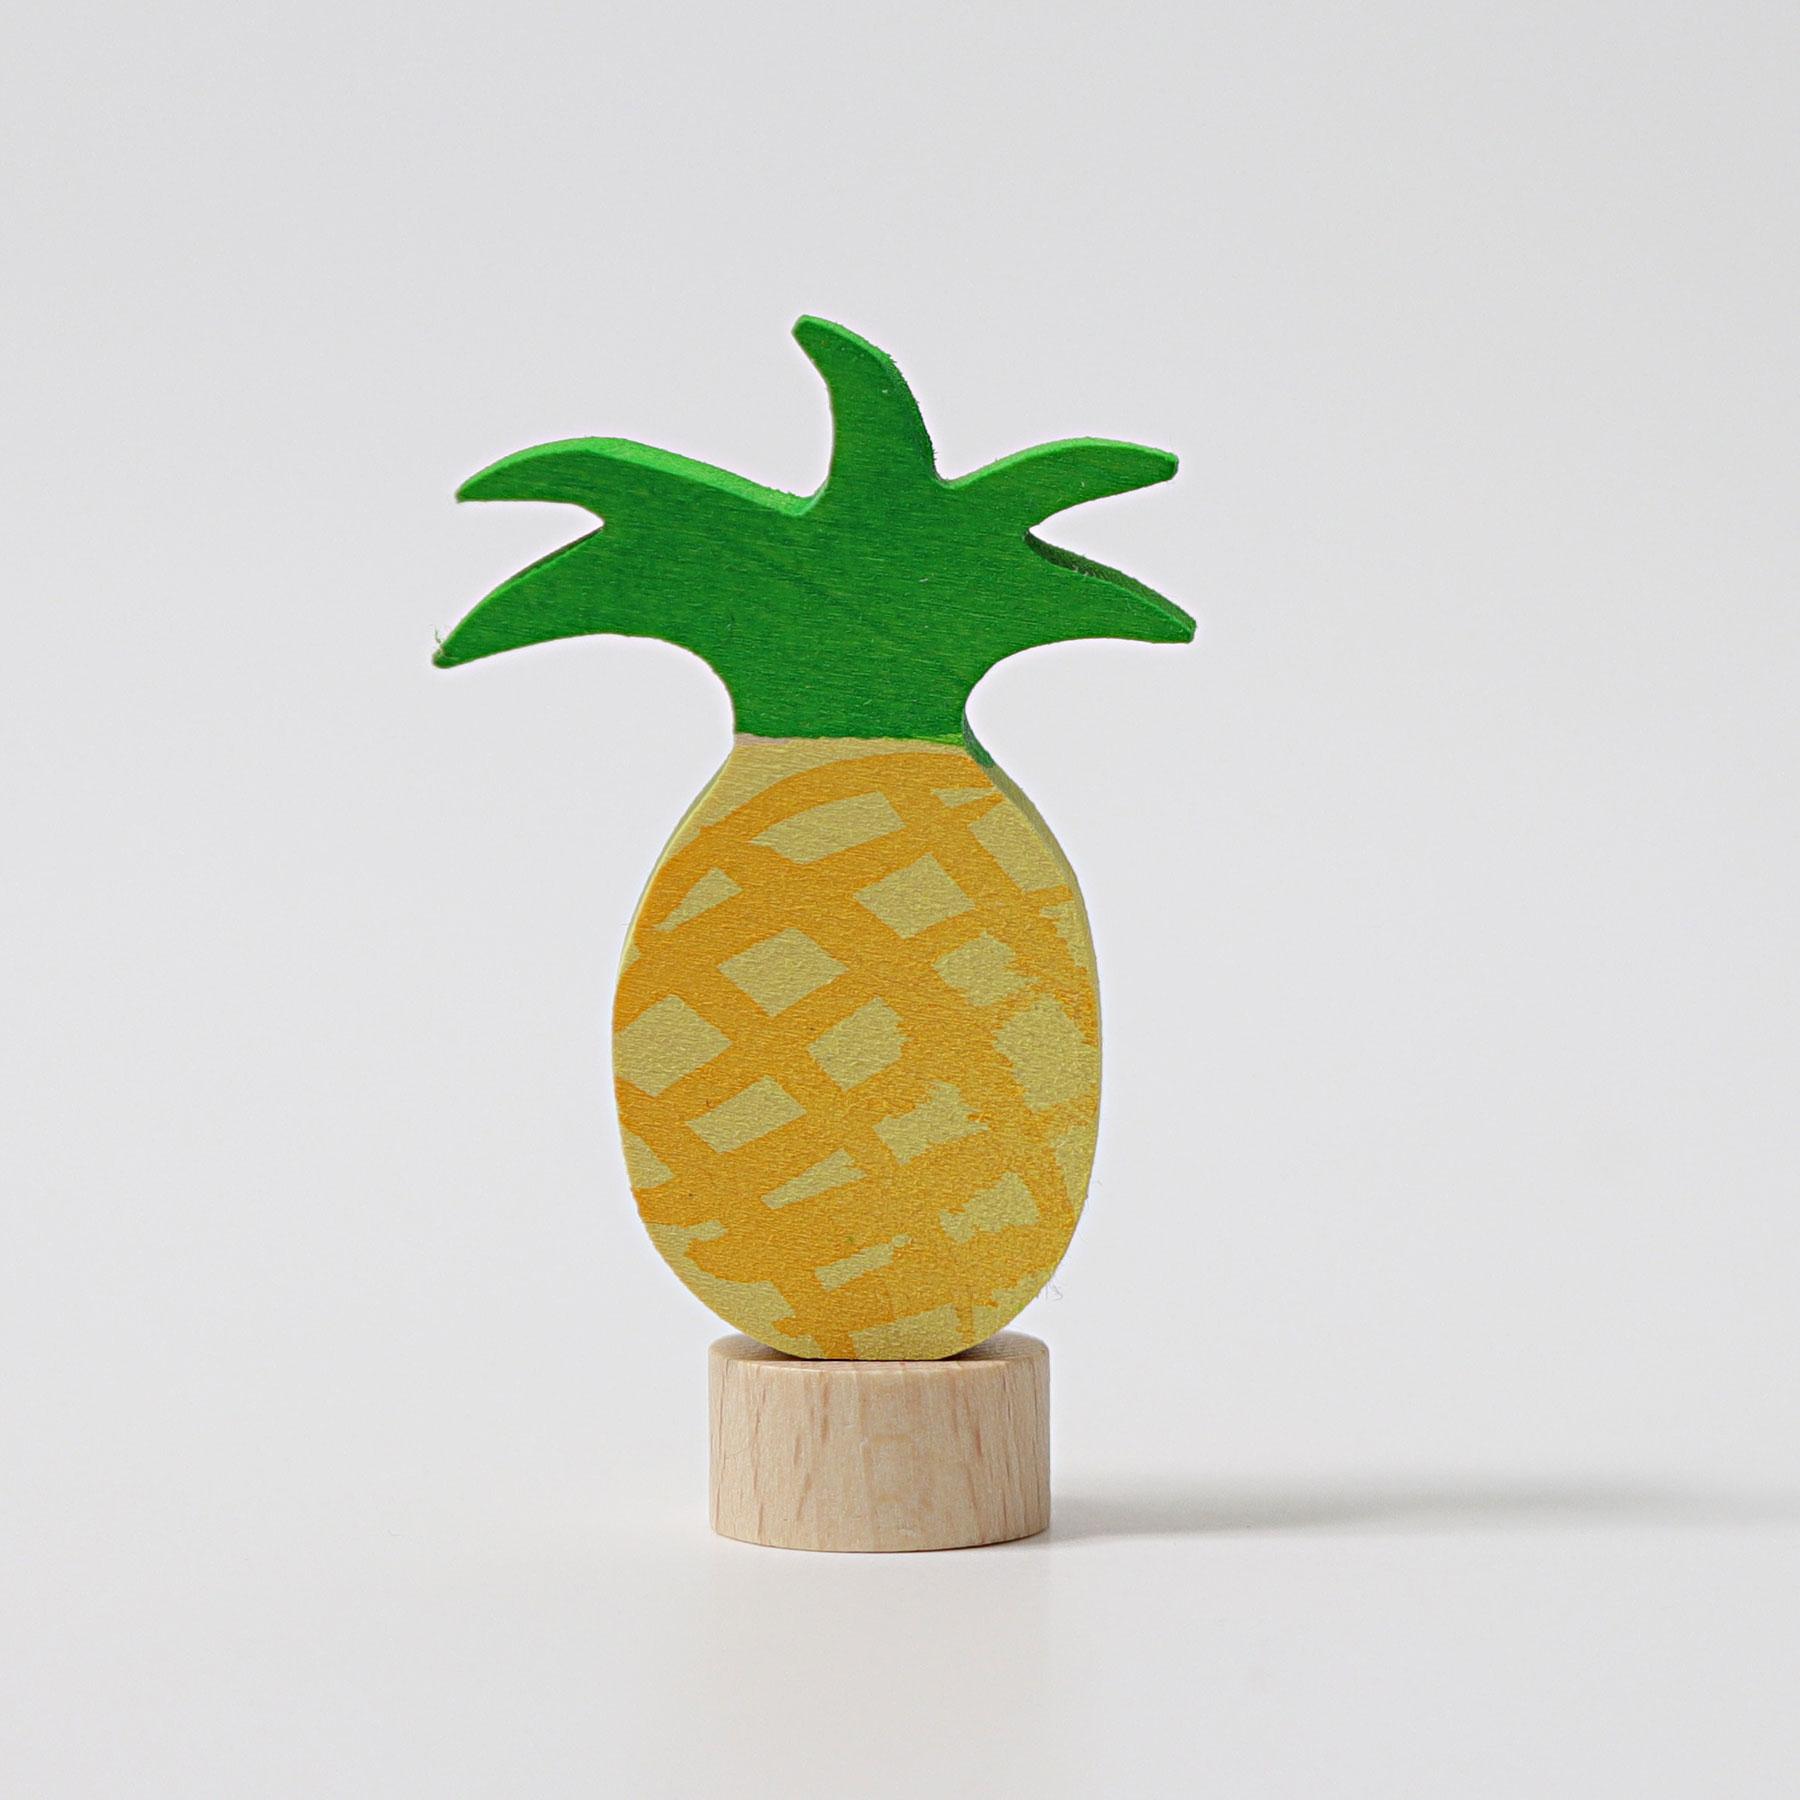 Ananás - Figura Decorativa - Grimm's